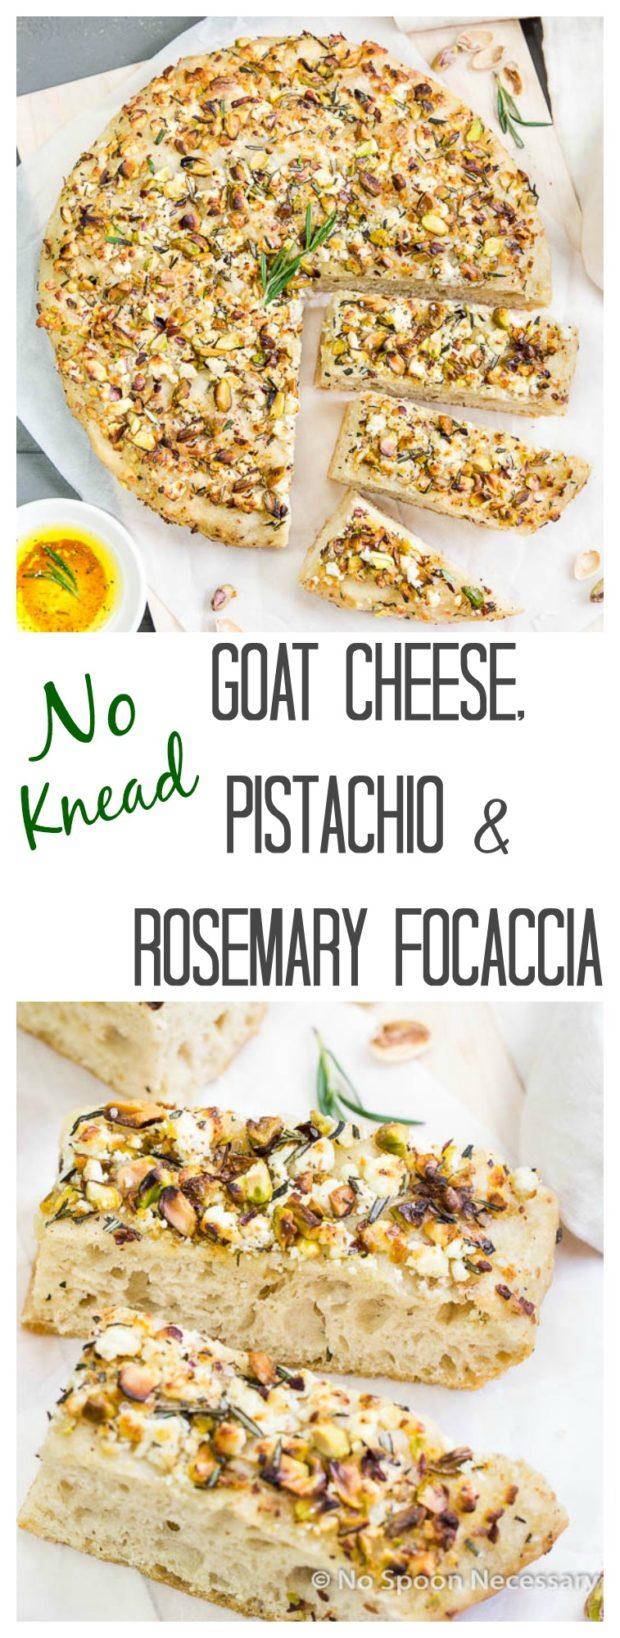 No Knead Goat Cheese, Pistachio & Rosemary Focaccia